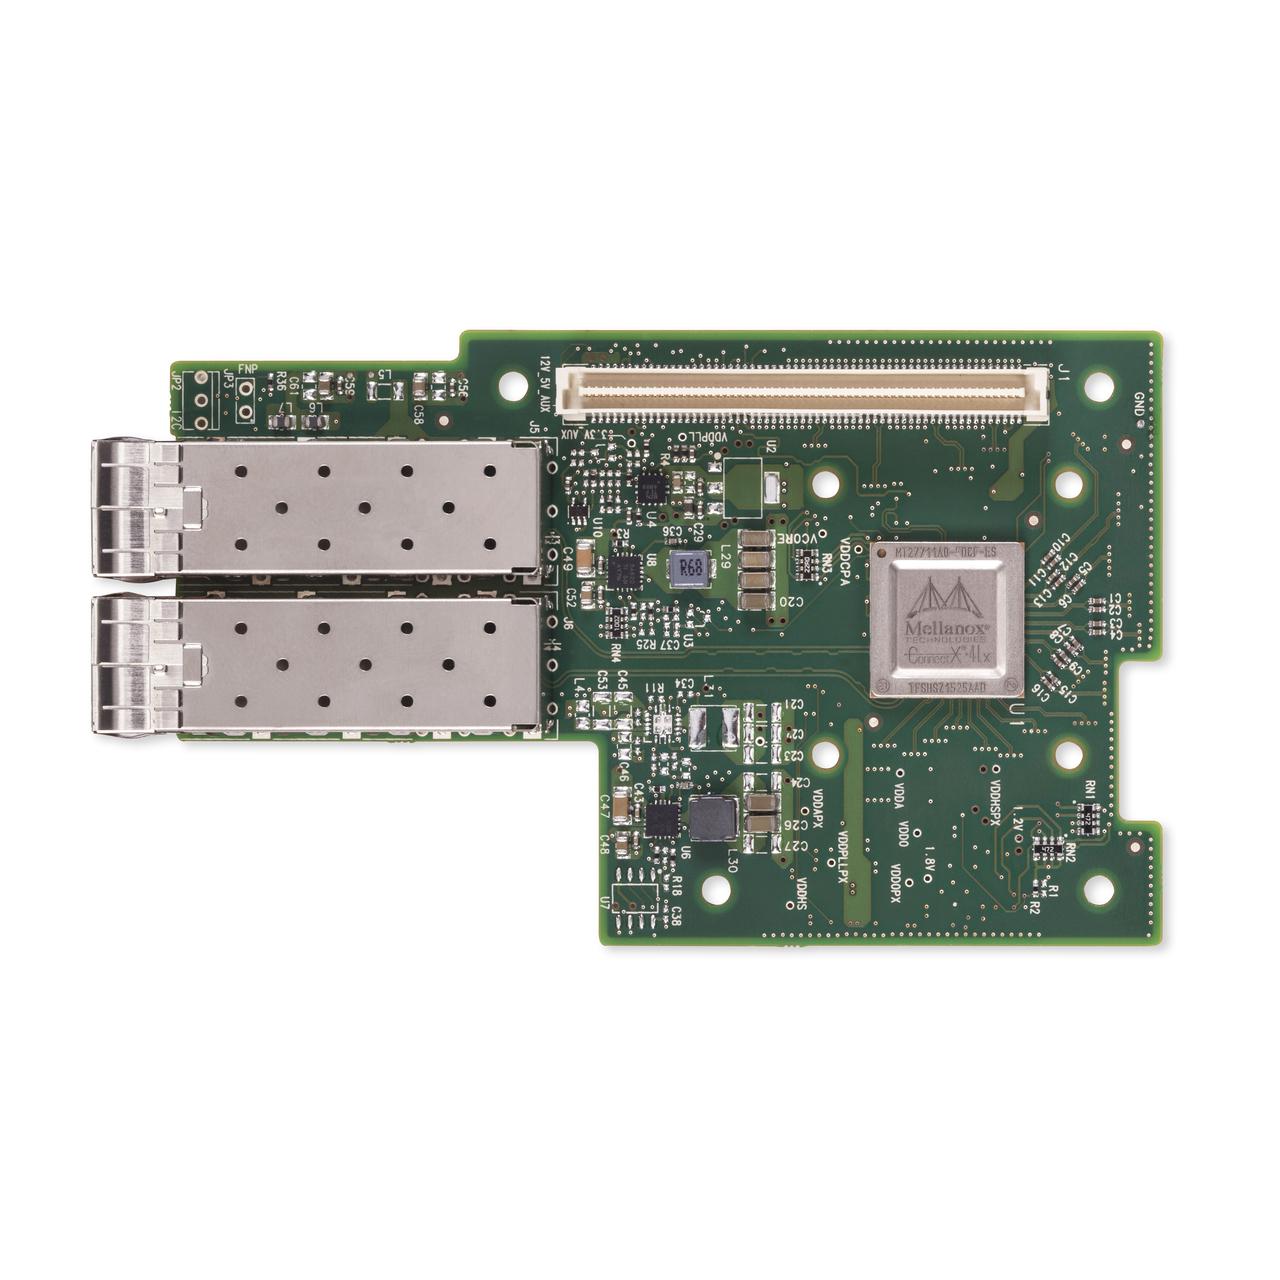 Mellanox Technologies MCX4421A-ACQN adaptador y tarjeta de red 25000 Mbit/s Interno